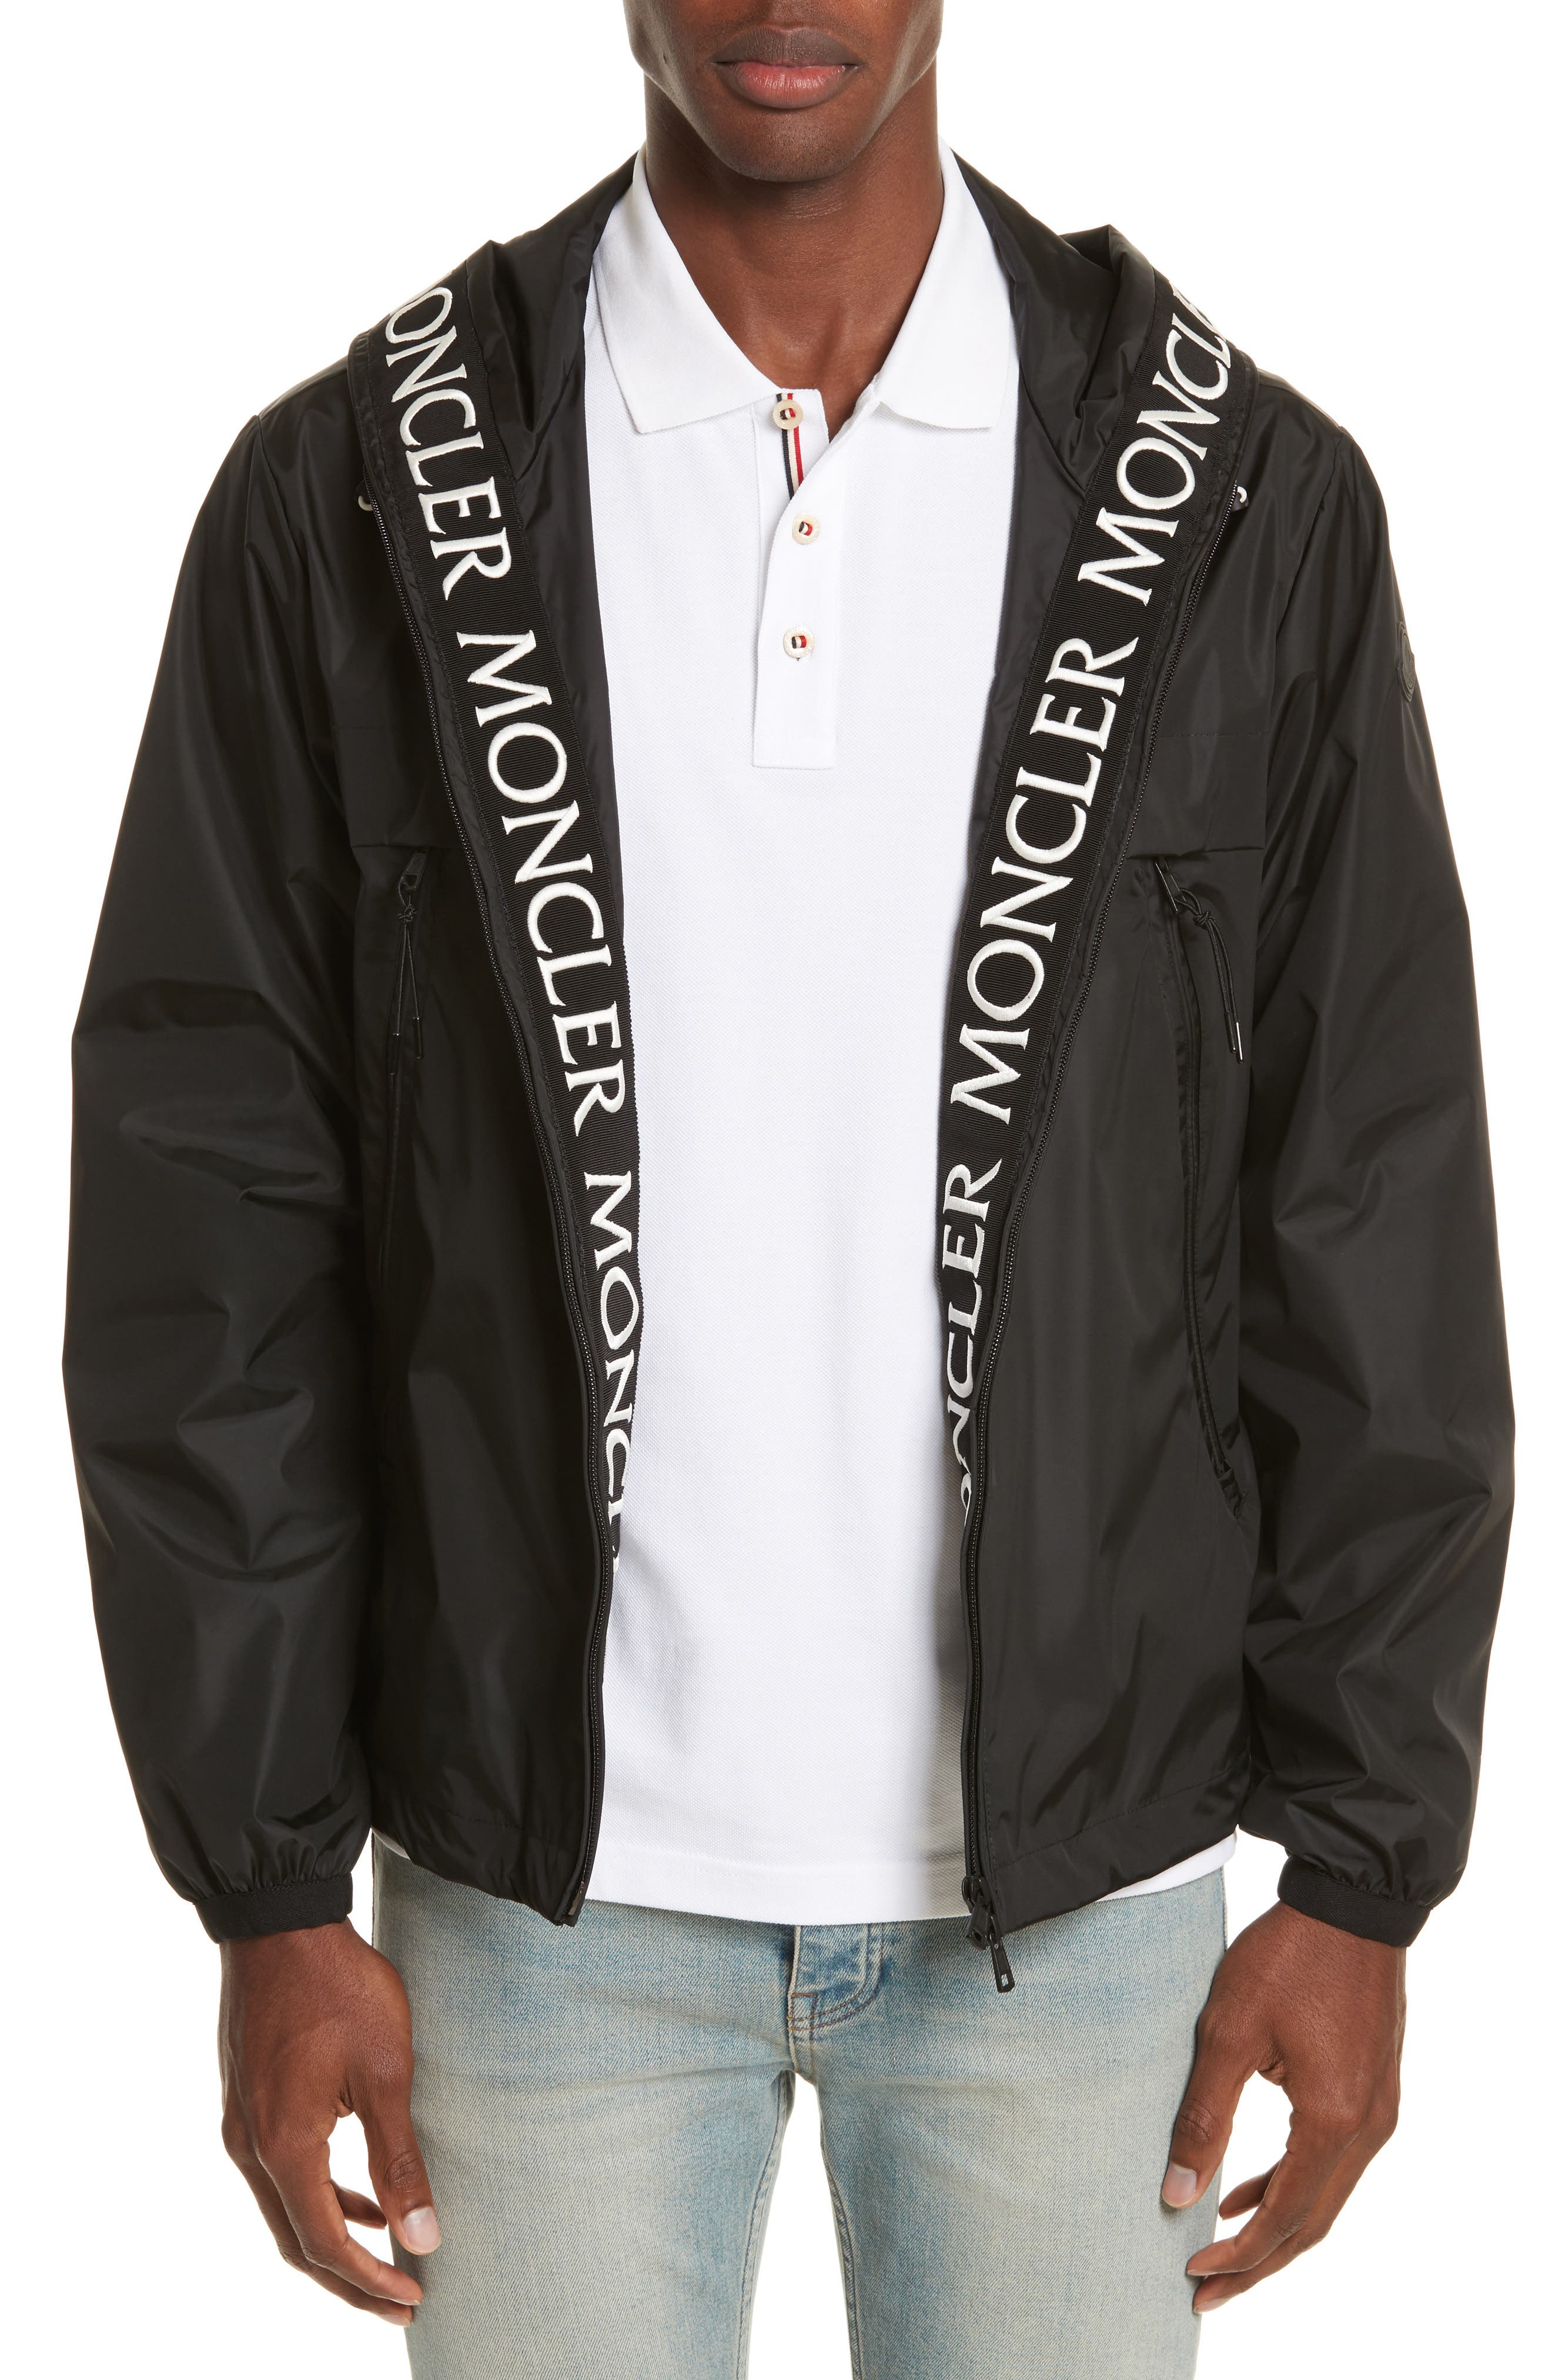 Massereau Zip Jacket,                             Main thumbnail 1, color,                             Black